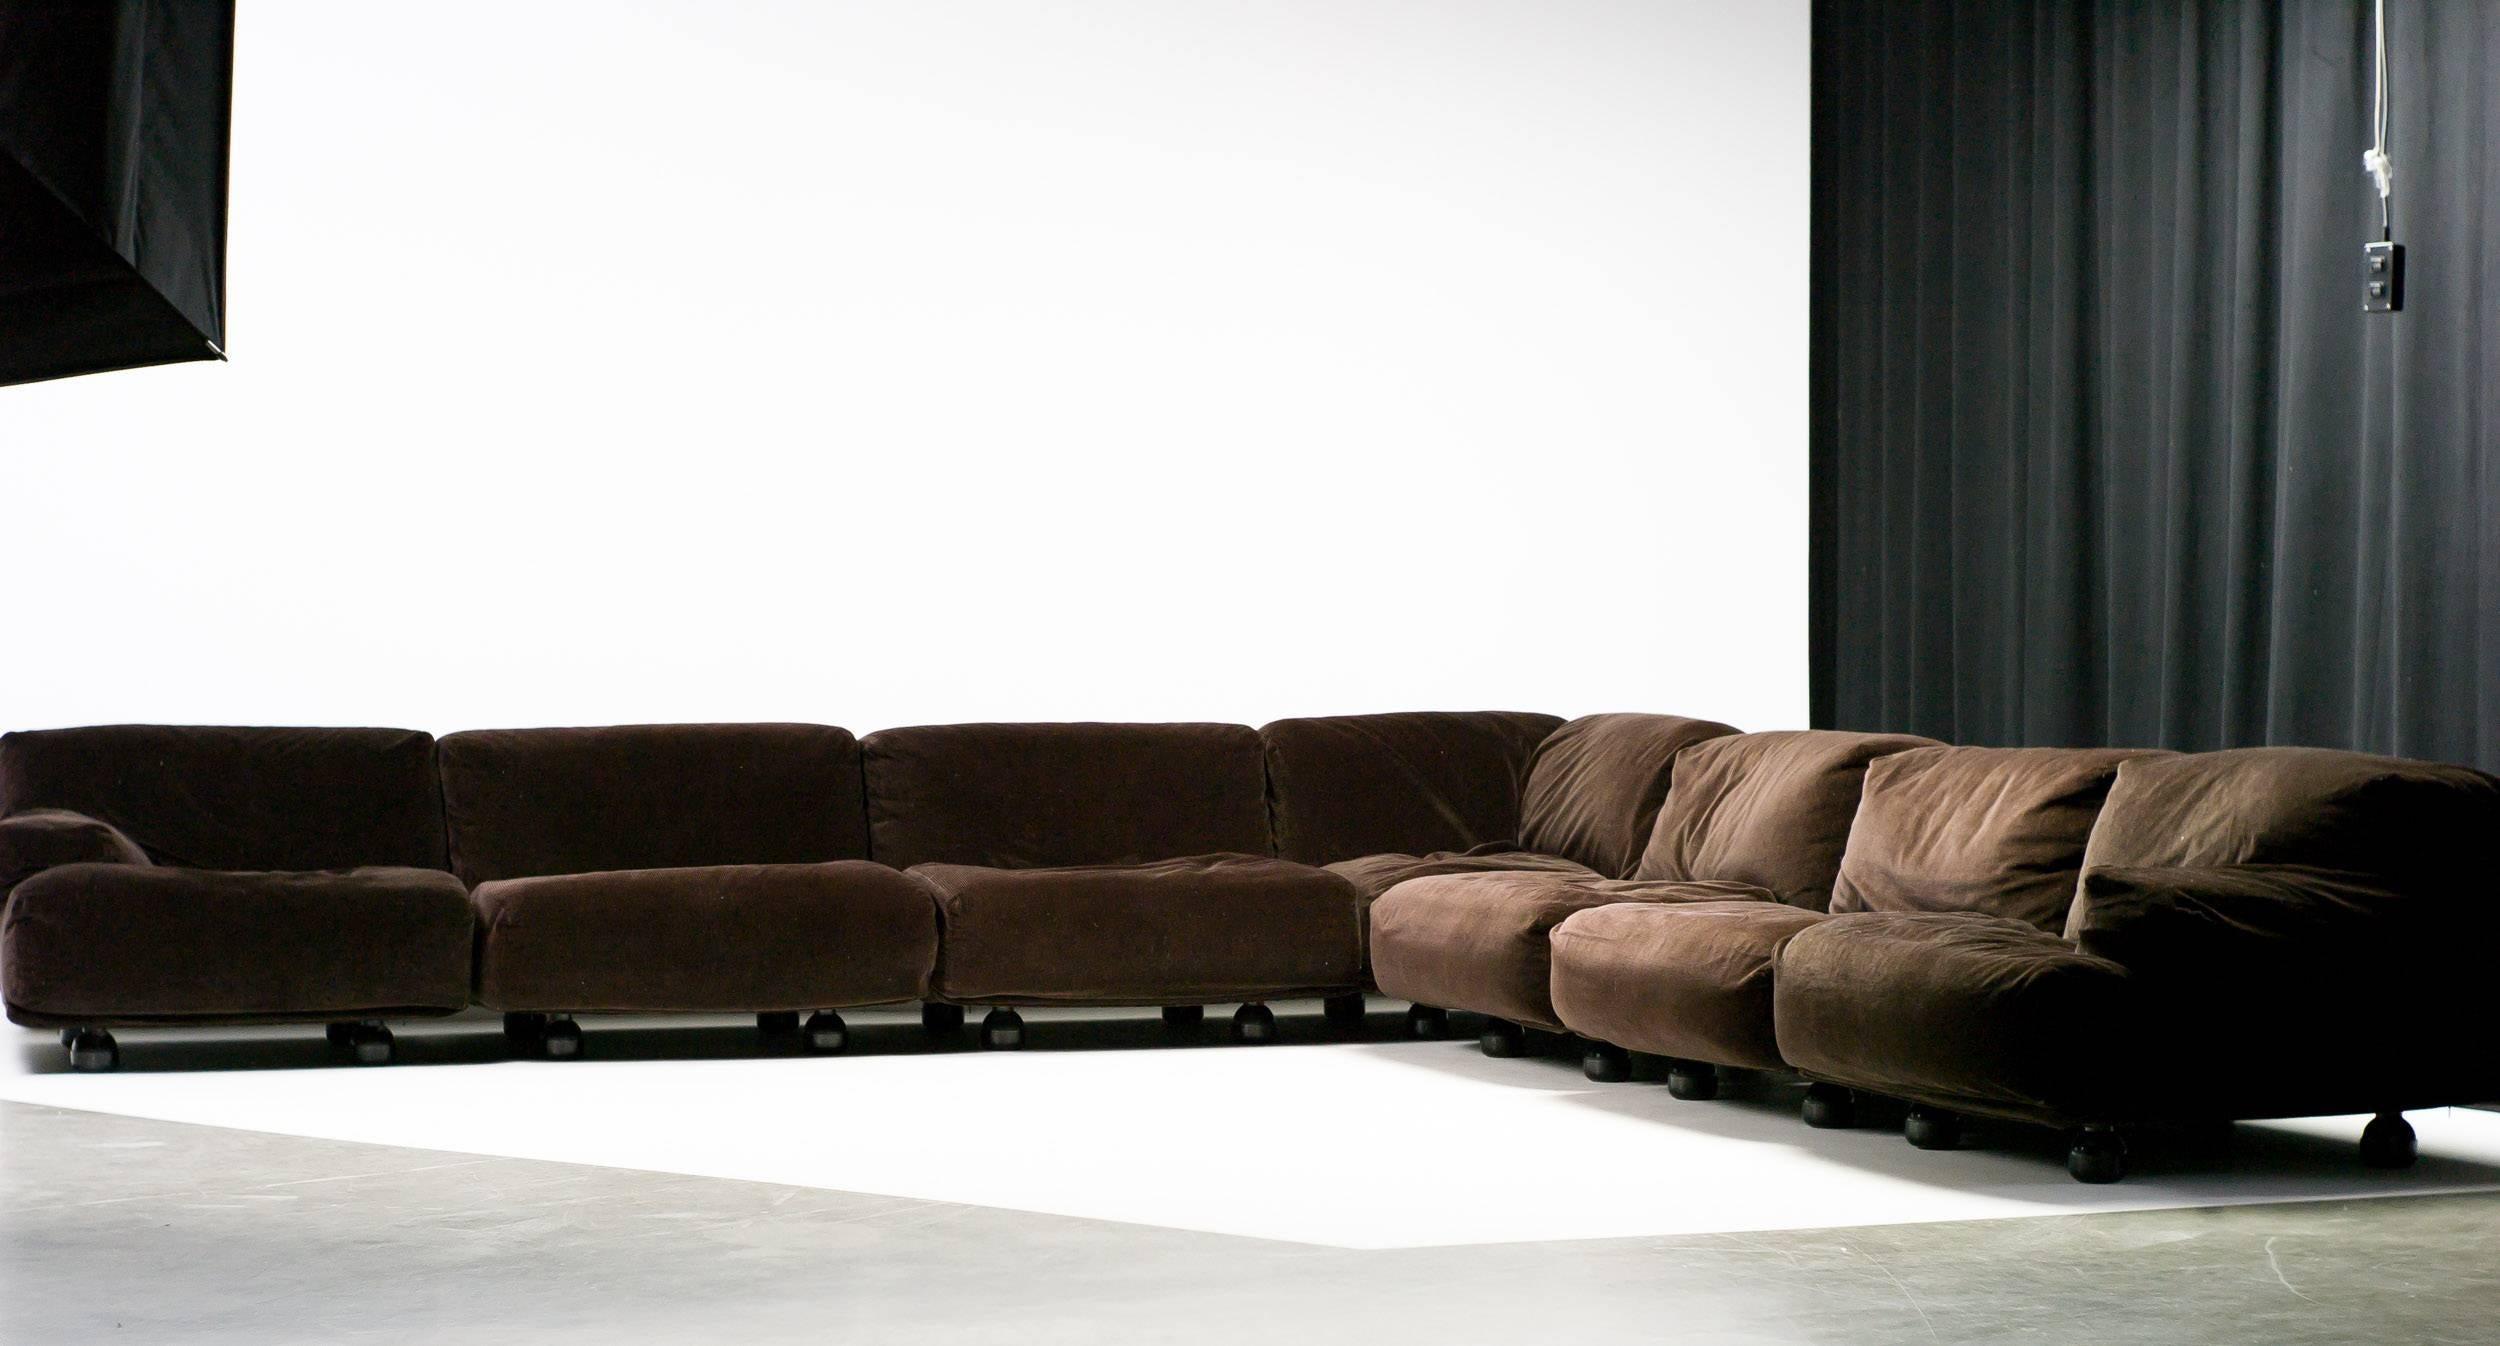 Velvet Very Large Fiandra Modular Sofa By Vico Magistretti For Cassina For  Sale